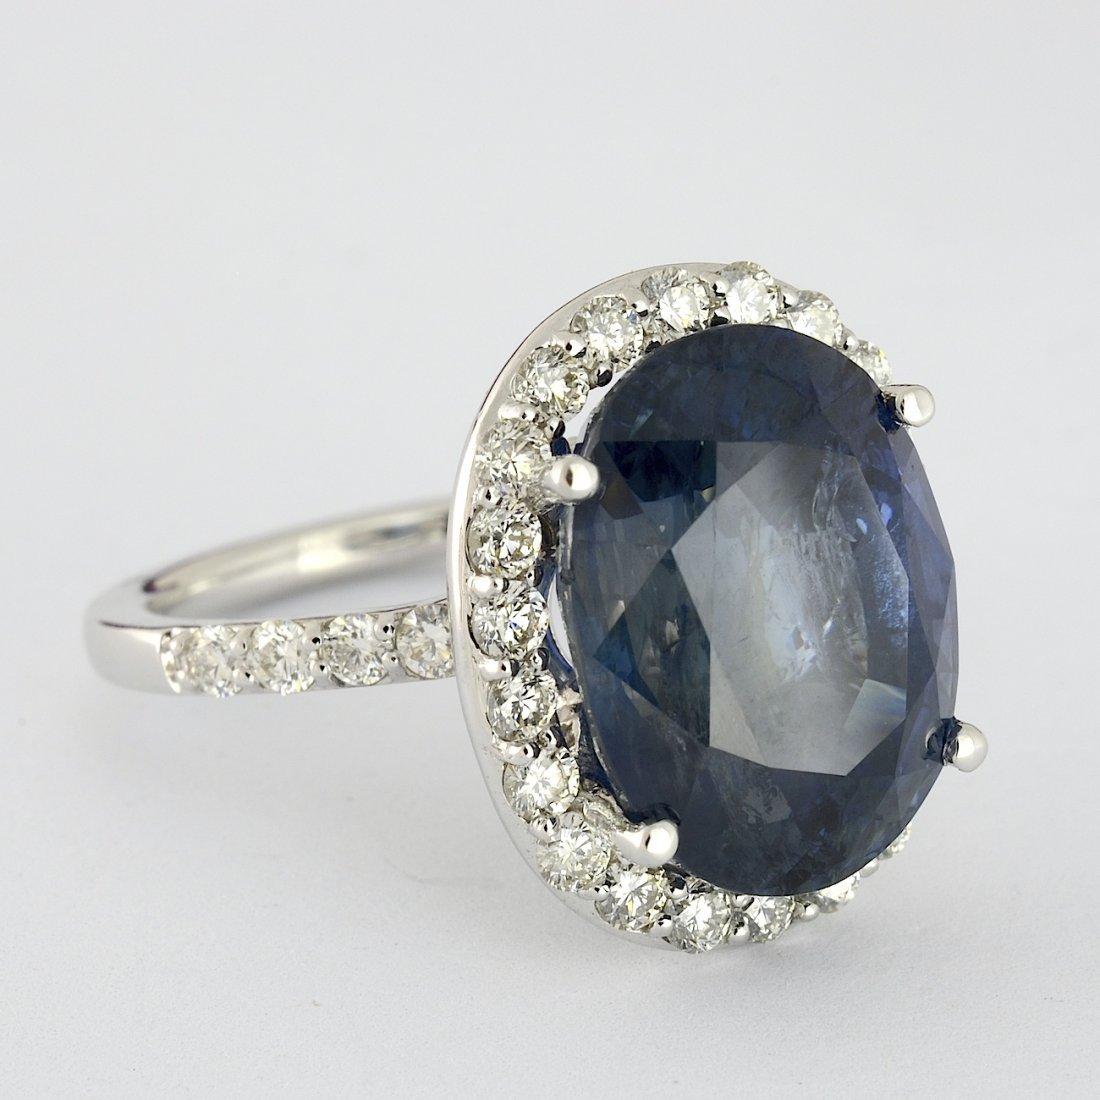 UNHEATED Sapphire & Diamond Ring (GIA) AV: $190,790